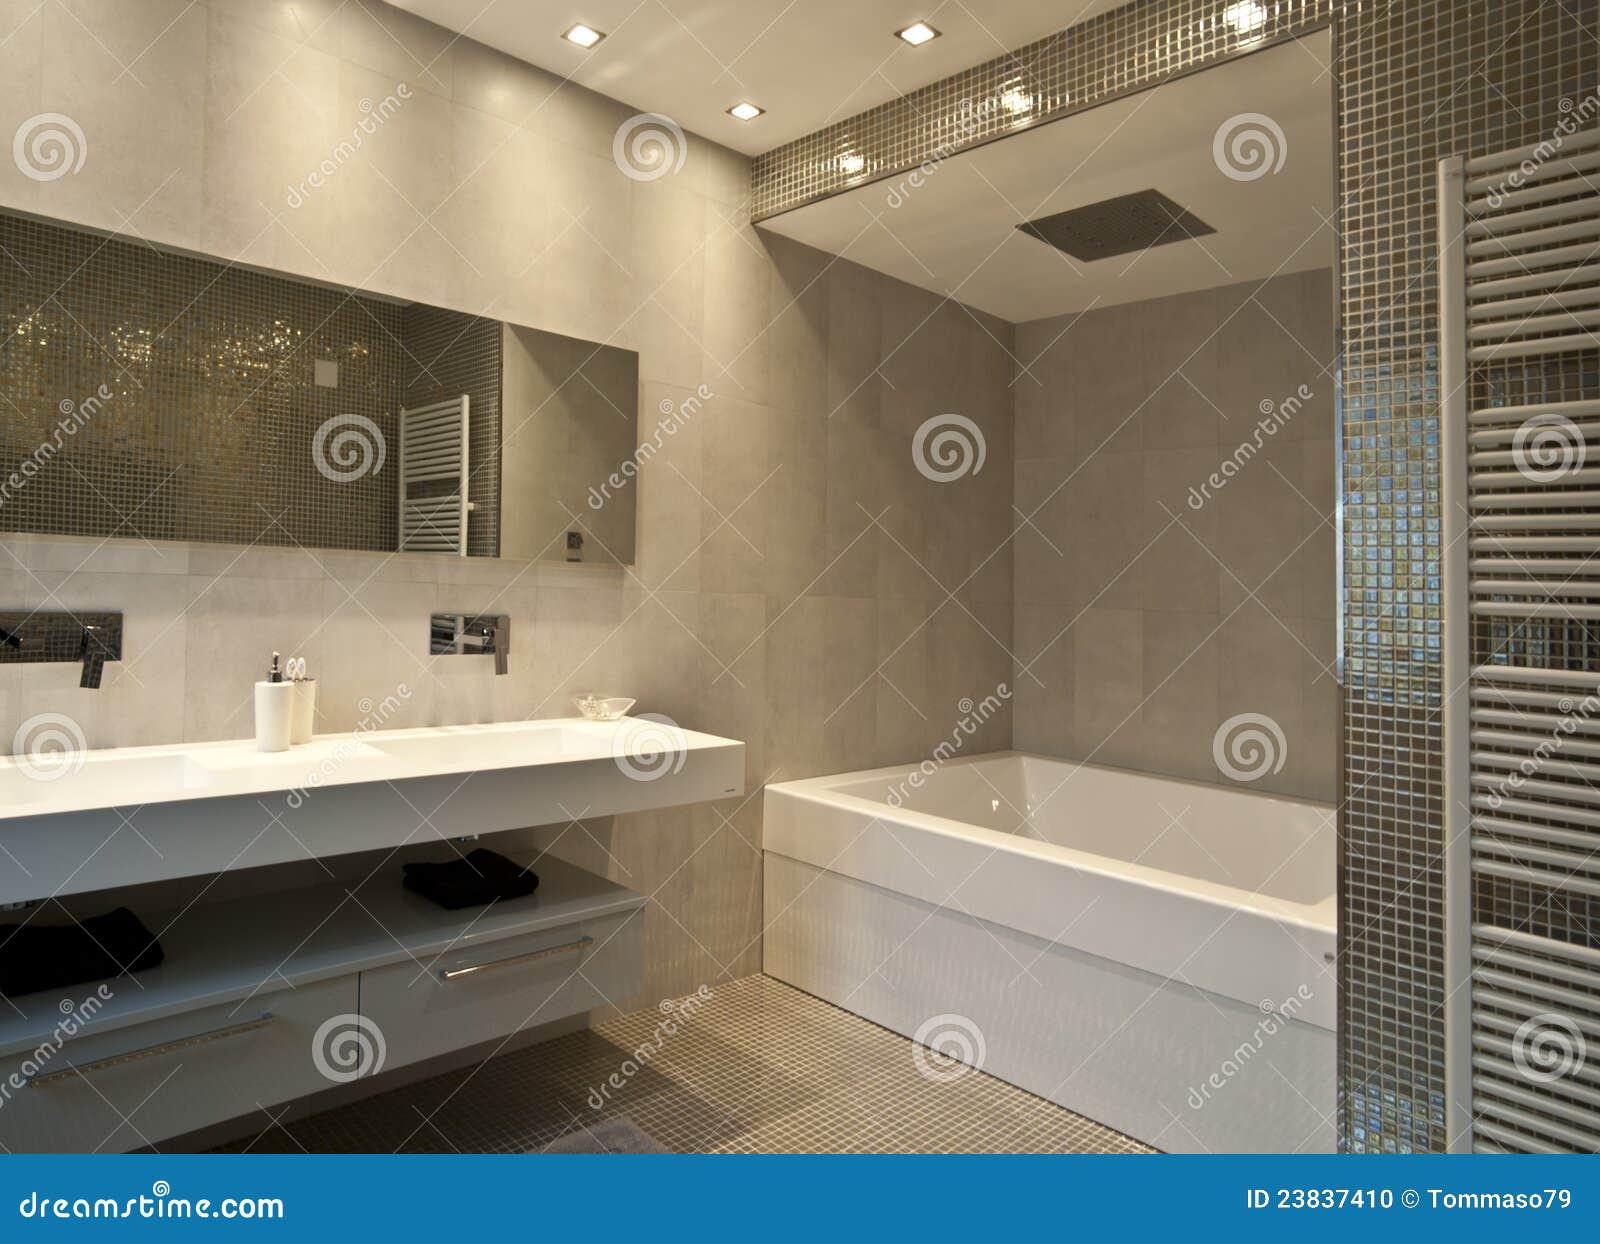 Toilette de lujo foto de archivo imagen 23837410 - Foto de toilette ...